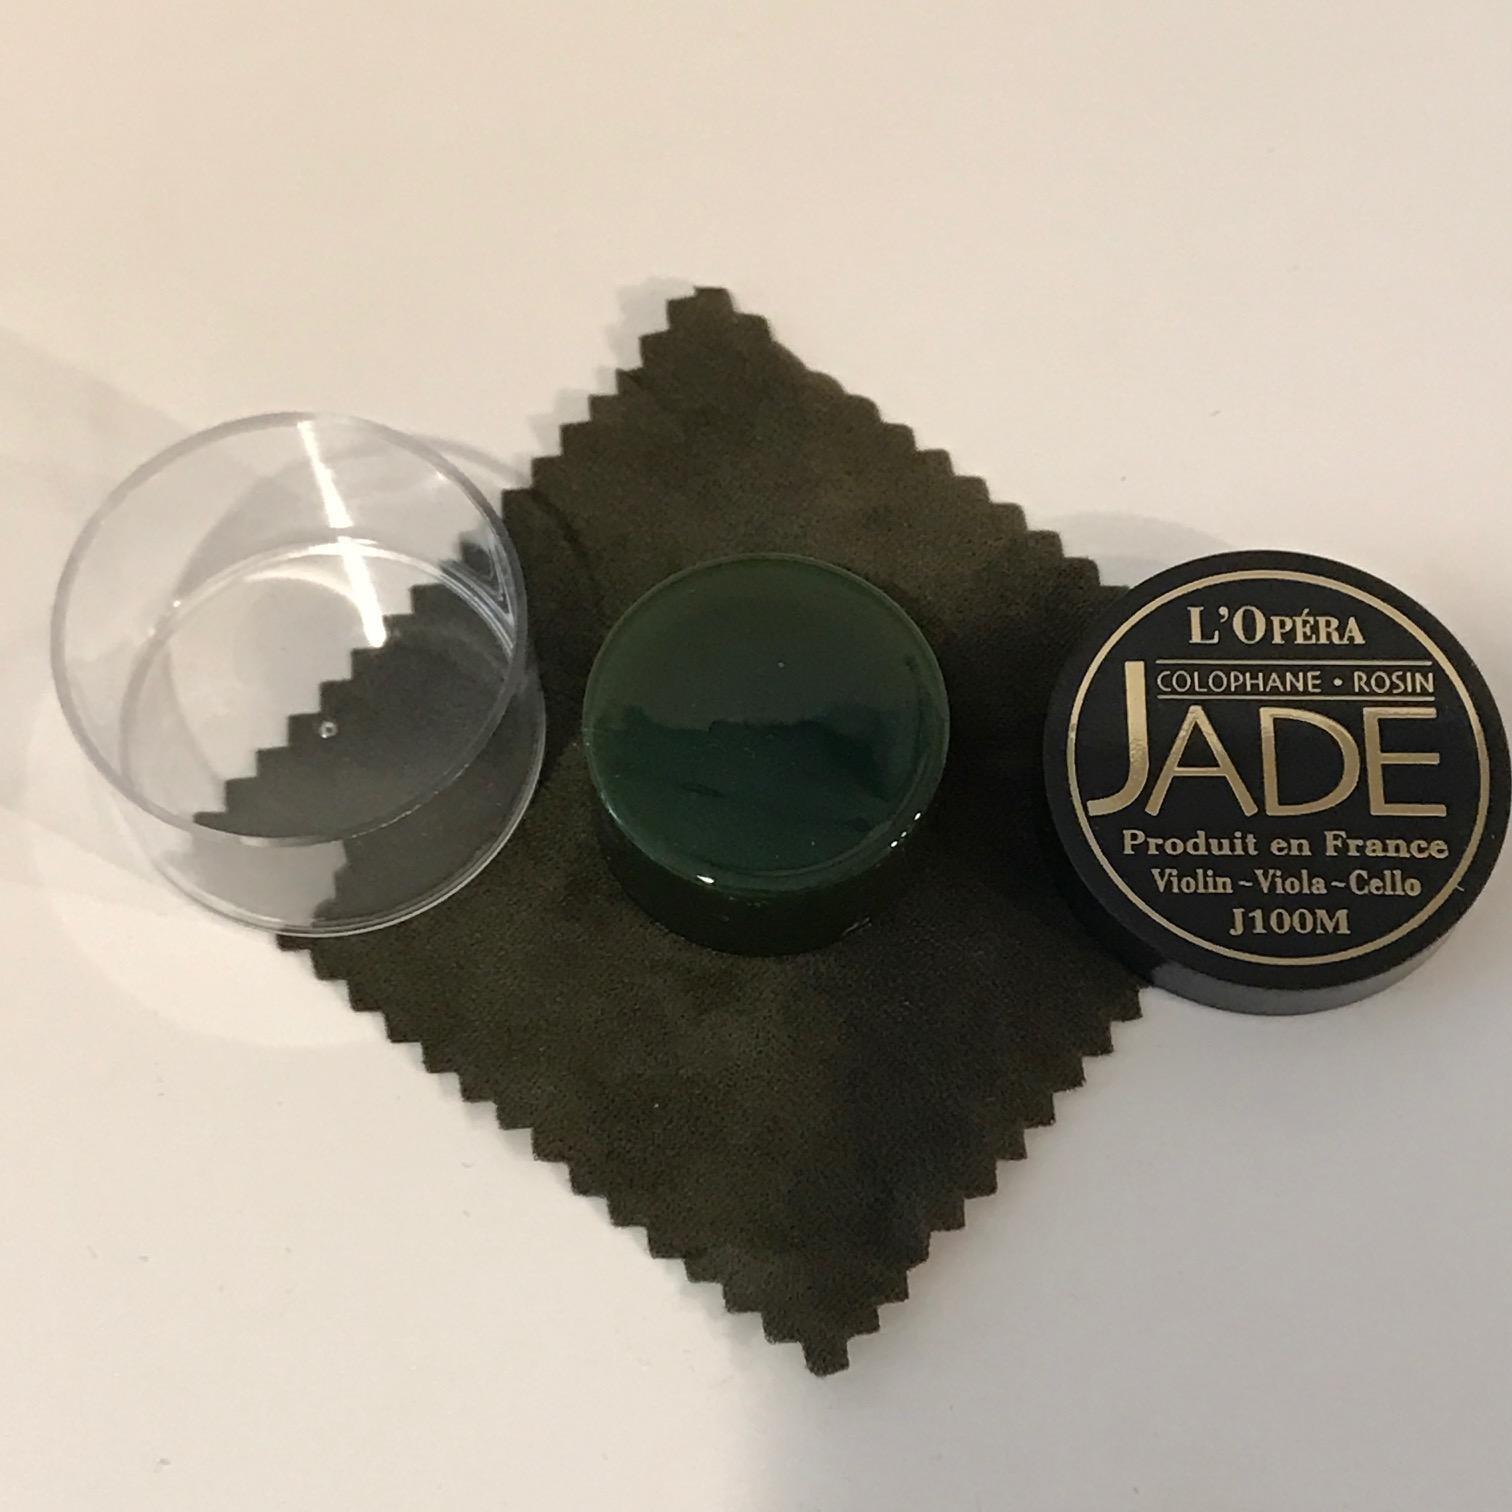 Jade L'Opera JADE Rosin for Violin, Viola, and Cello